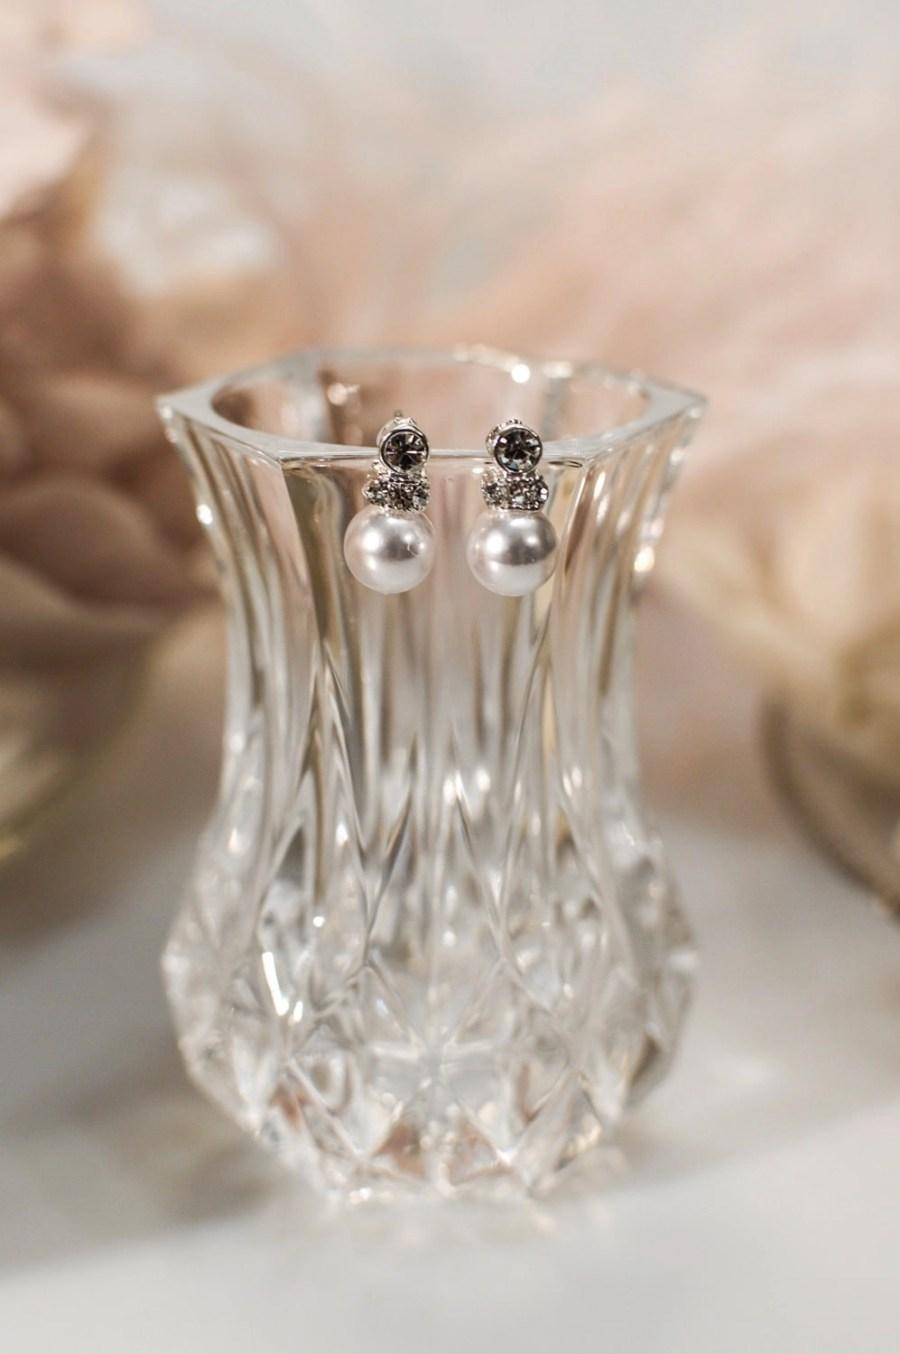 tls1536 earrings on glass closeup resized